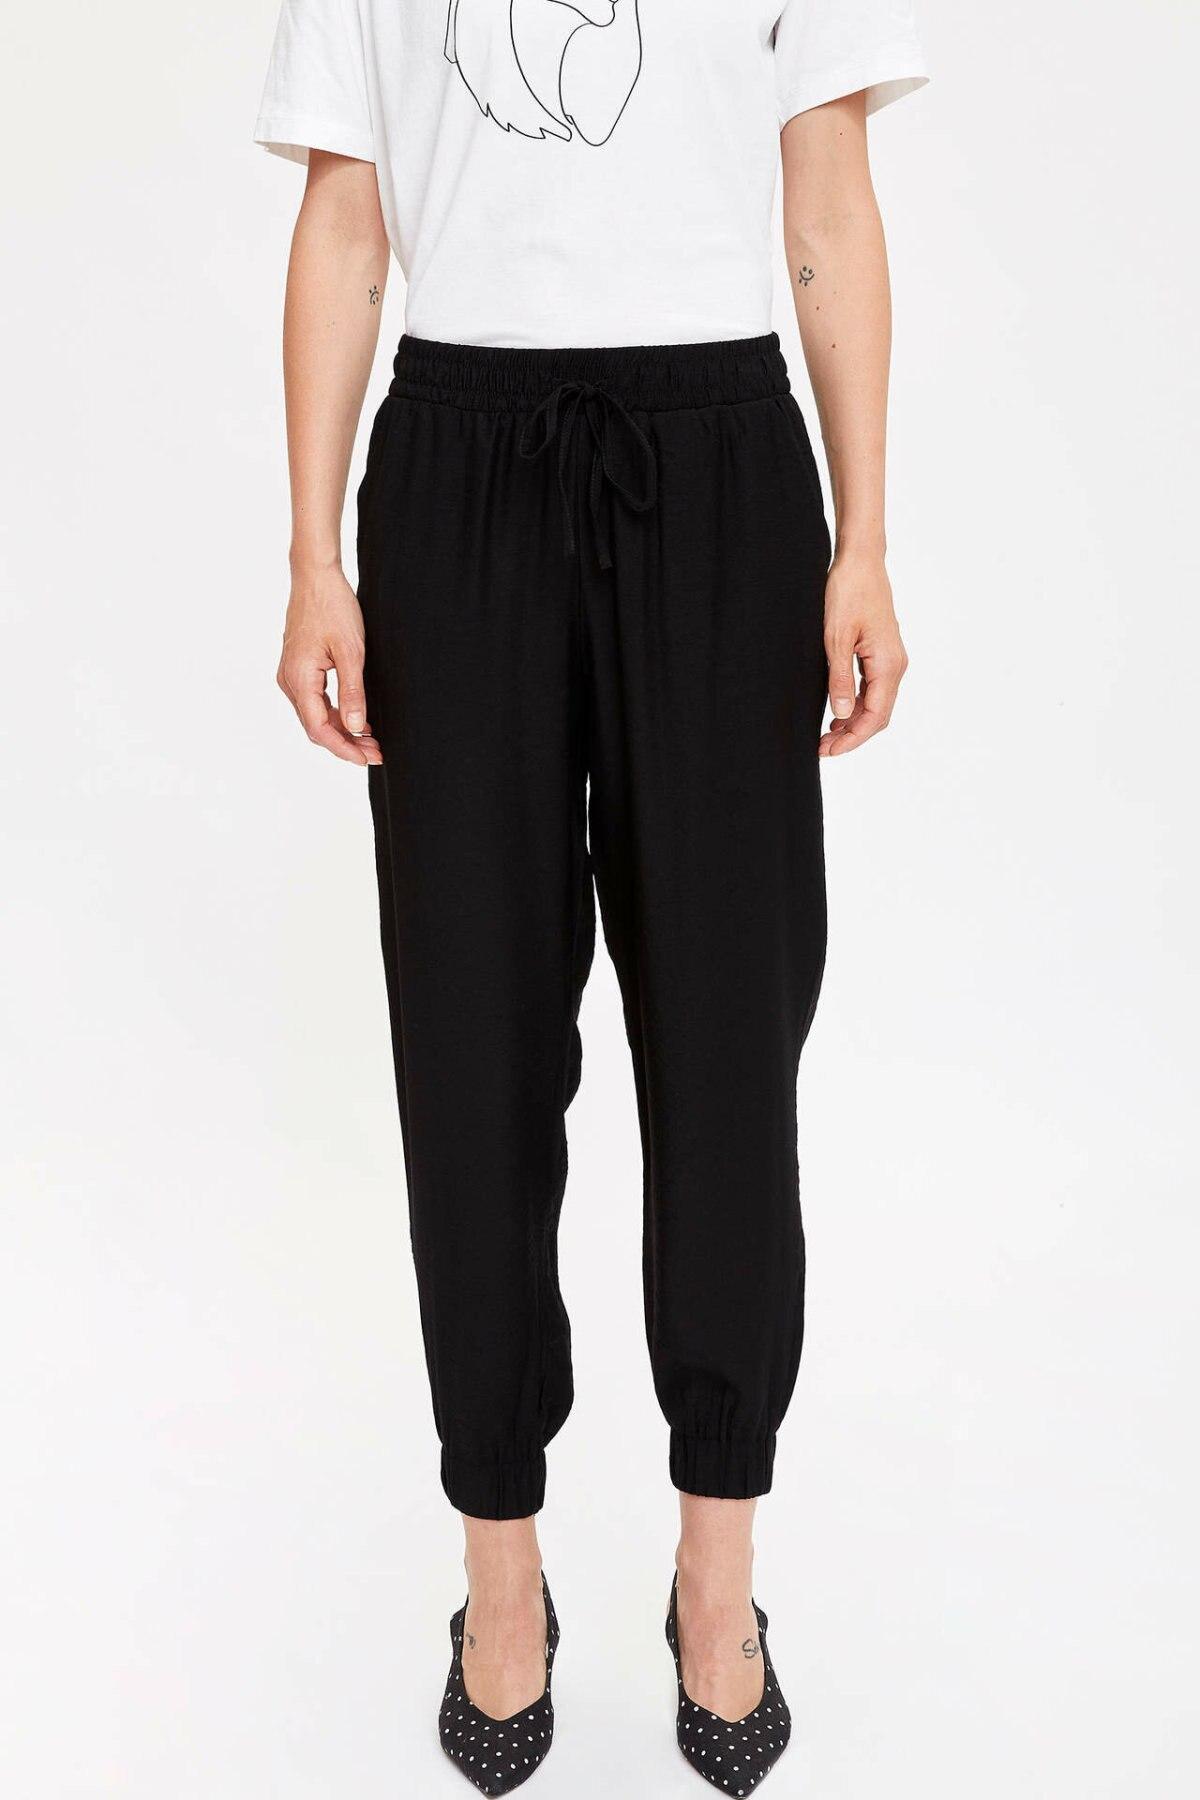 DeFacto Woman Fashion Sport Trousers Female Casual Drawstring Loose Pants Ladies Comfort Loose Sweatpants New - L5401AZ19SM